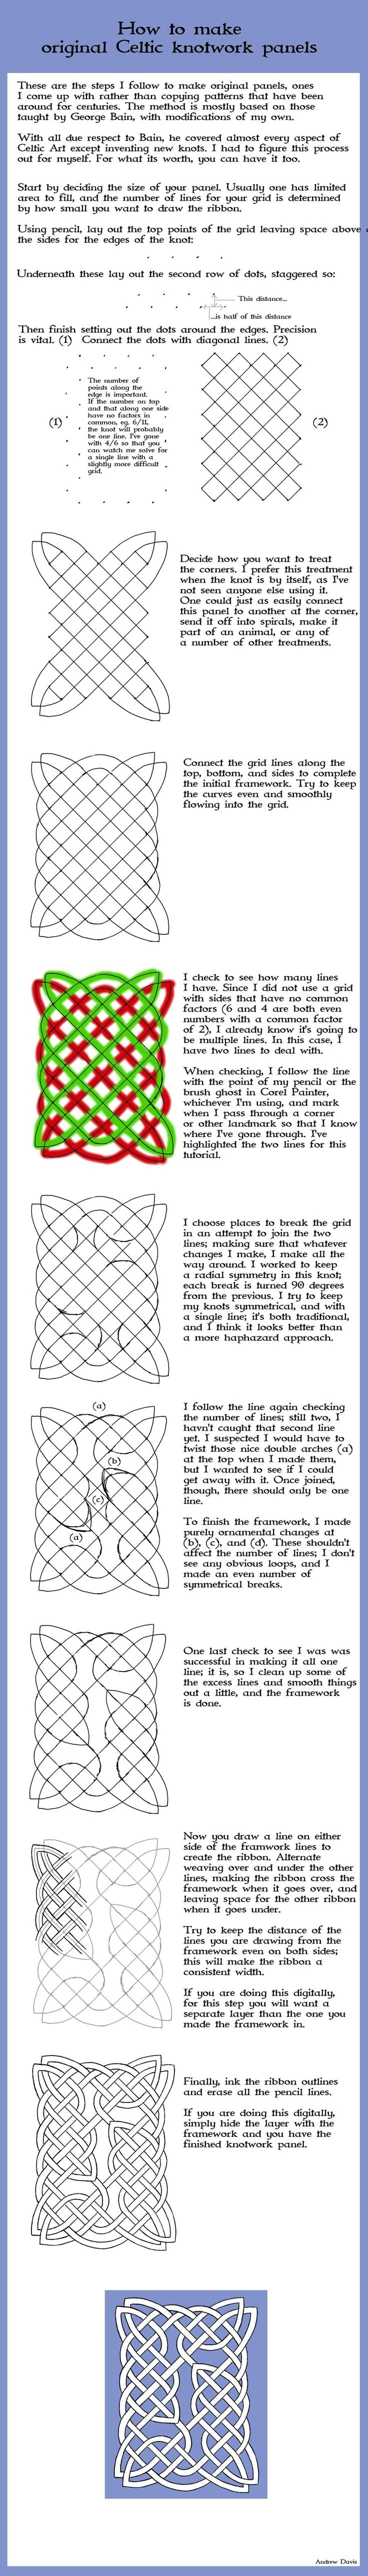 "celtic knotwork & design ""tutorial 2"" : beautifully laid out resource {Andrew Davis / Dweran, deviantART}"